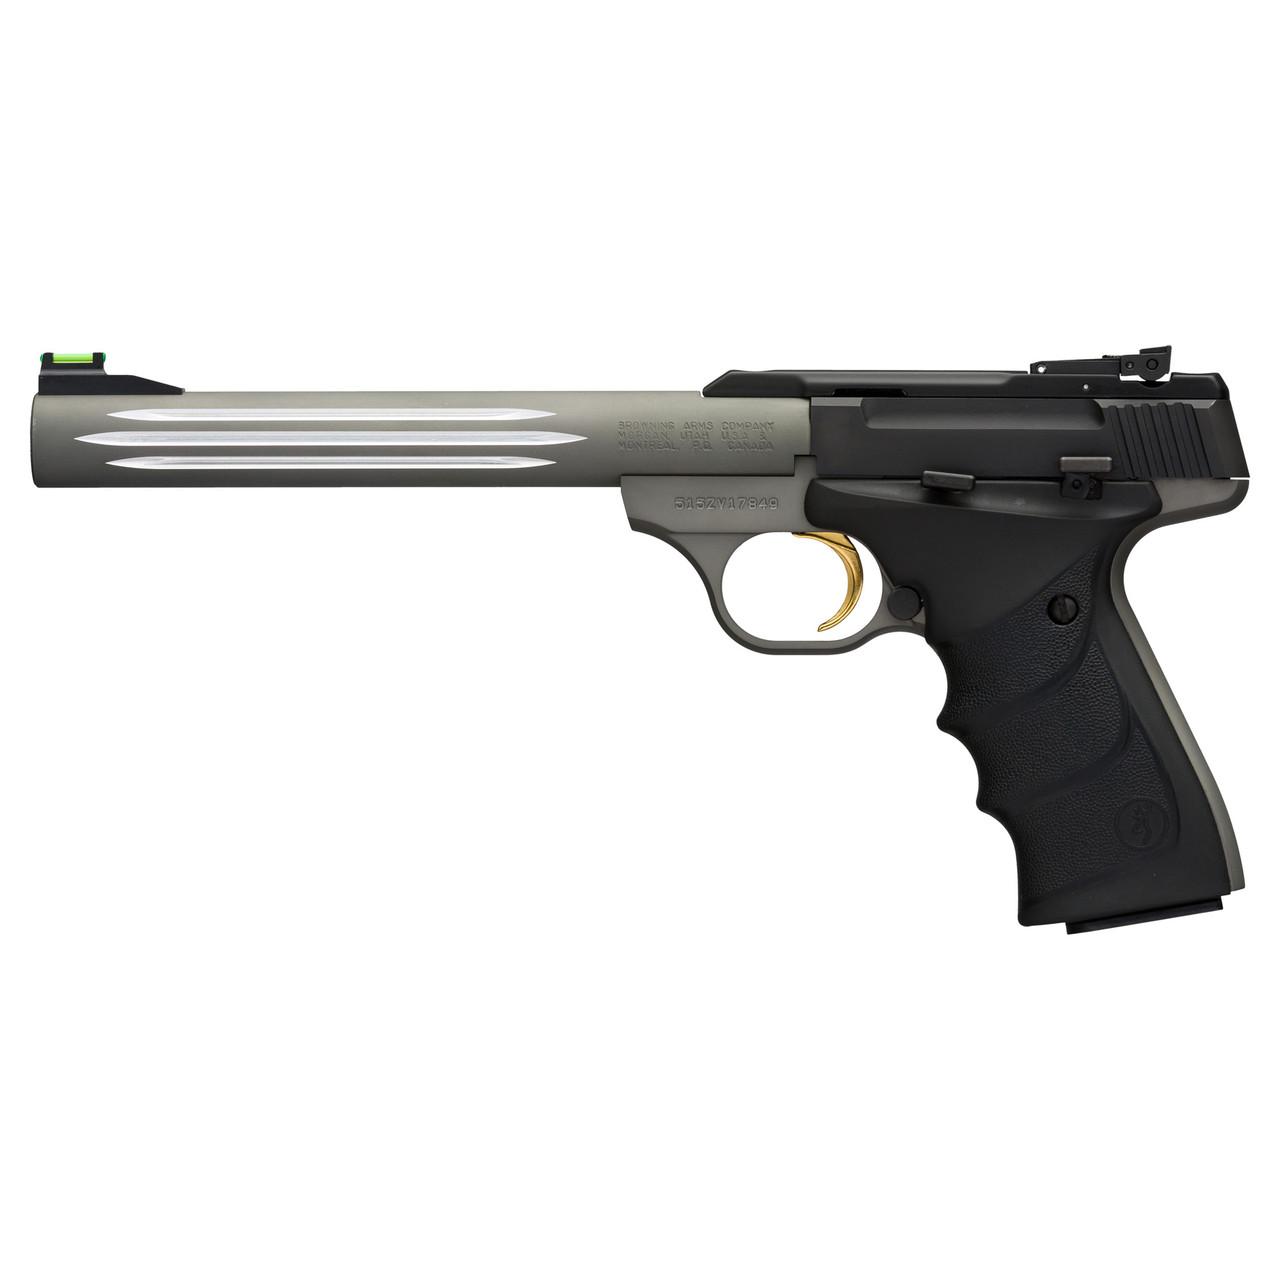 Browning Buckmark URX7 CALIFORNIA LEGAL - .22LR - Lite Gray